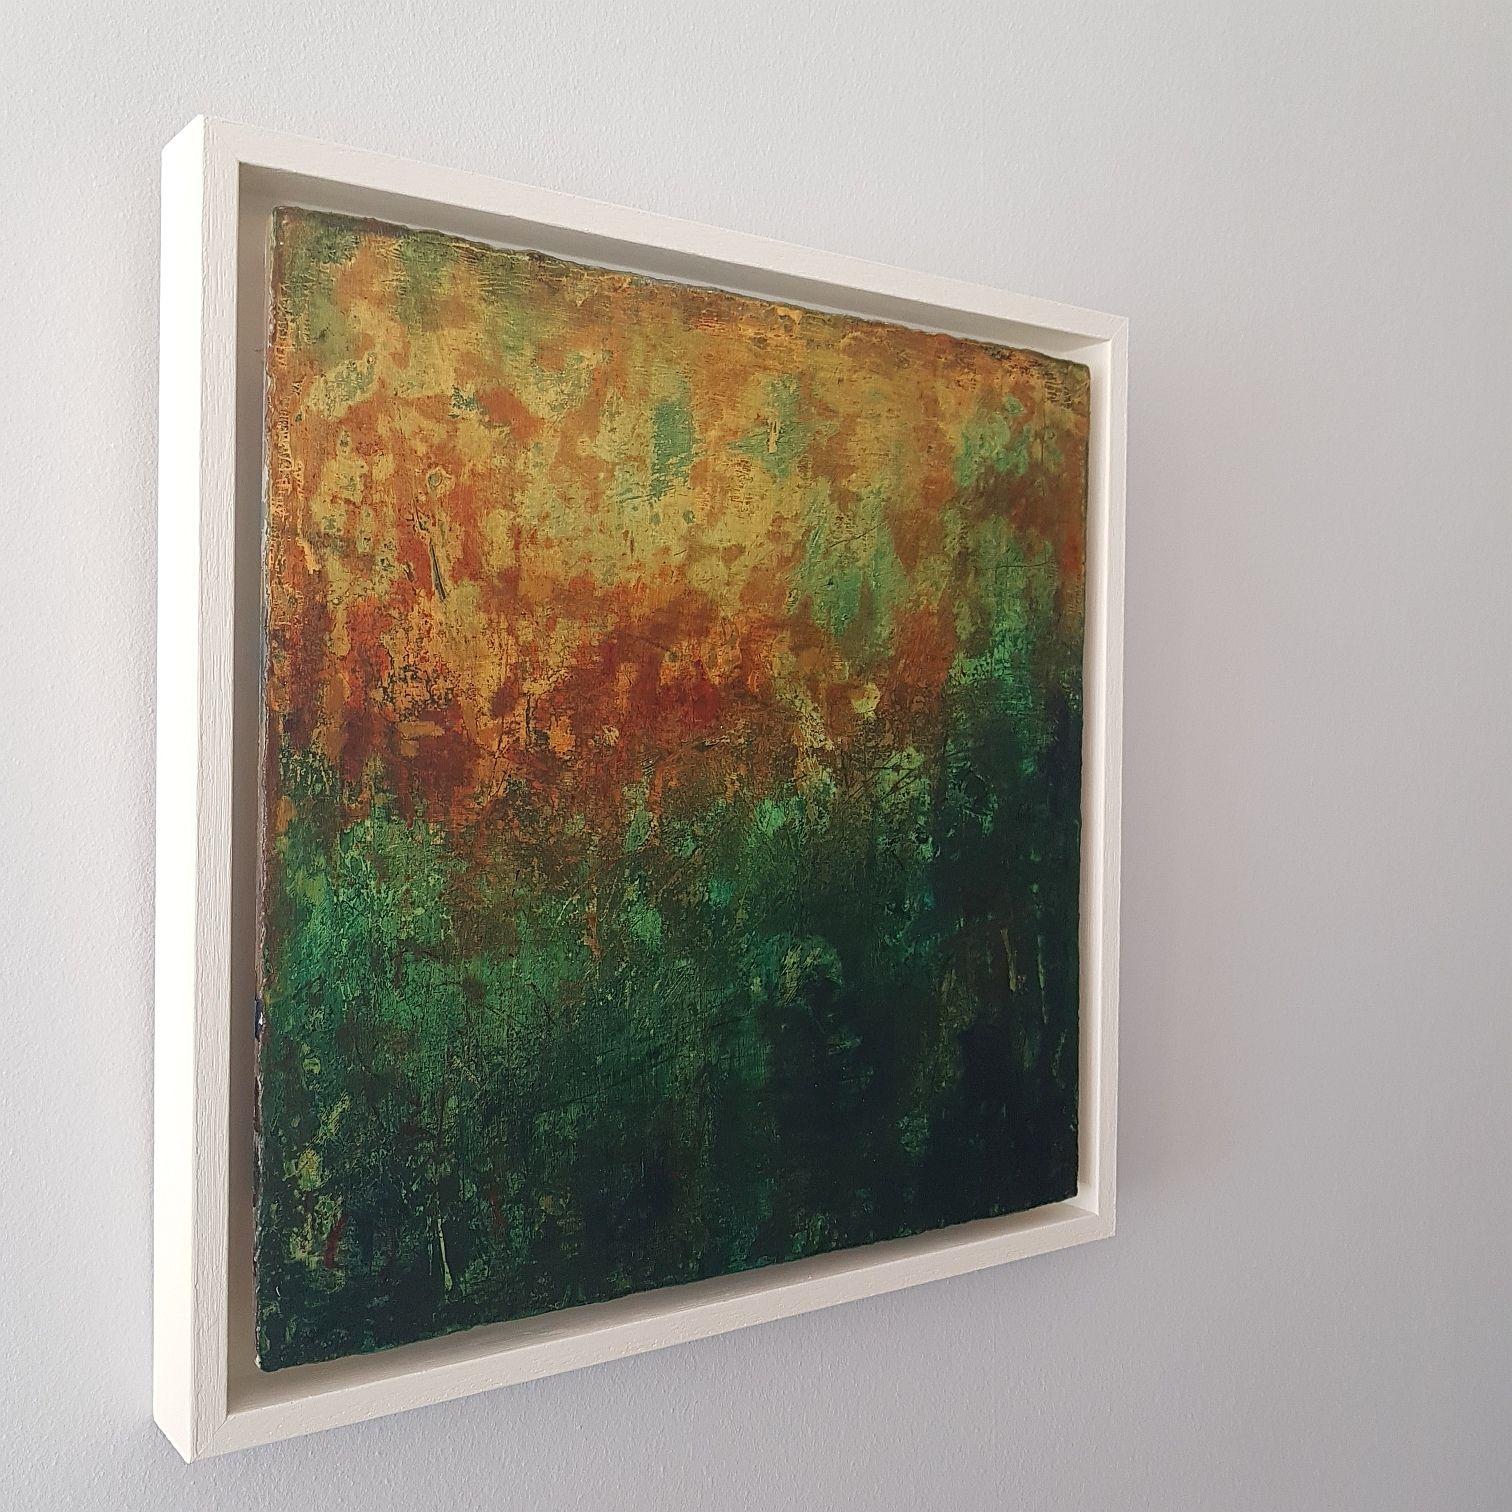 Golden Light and Dappled Shade display1